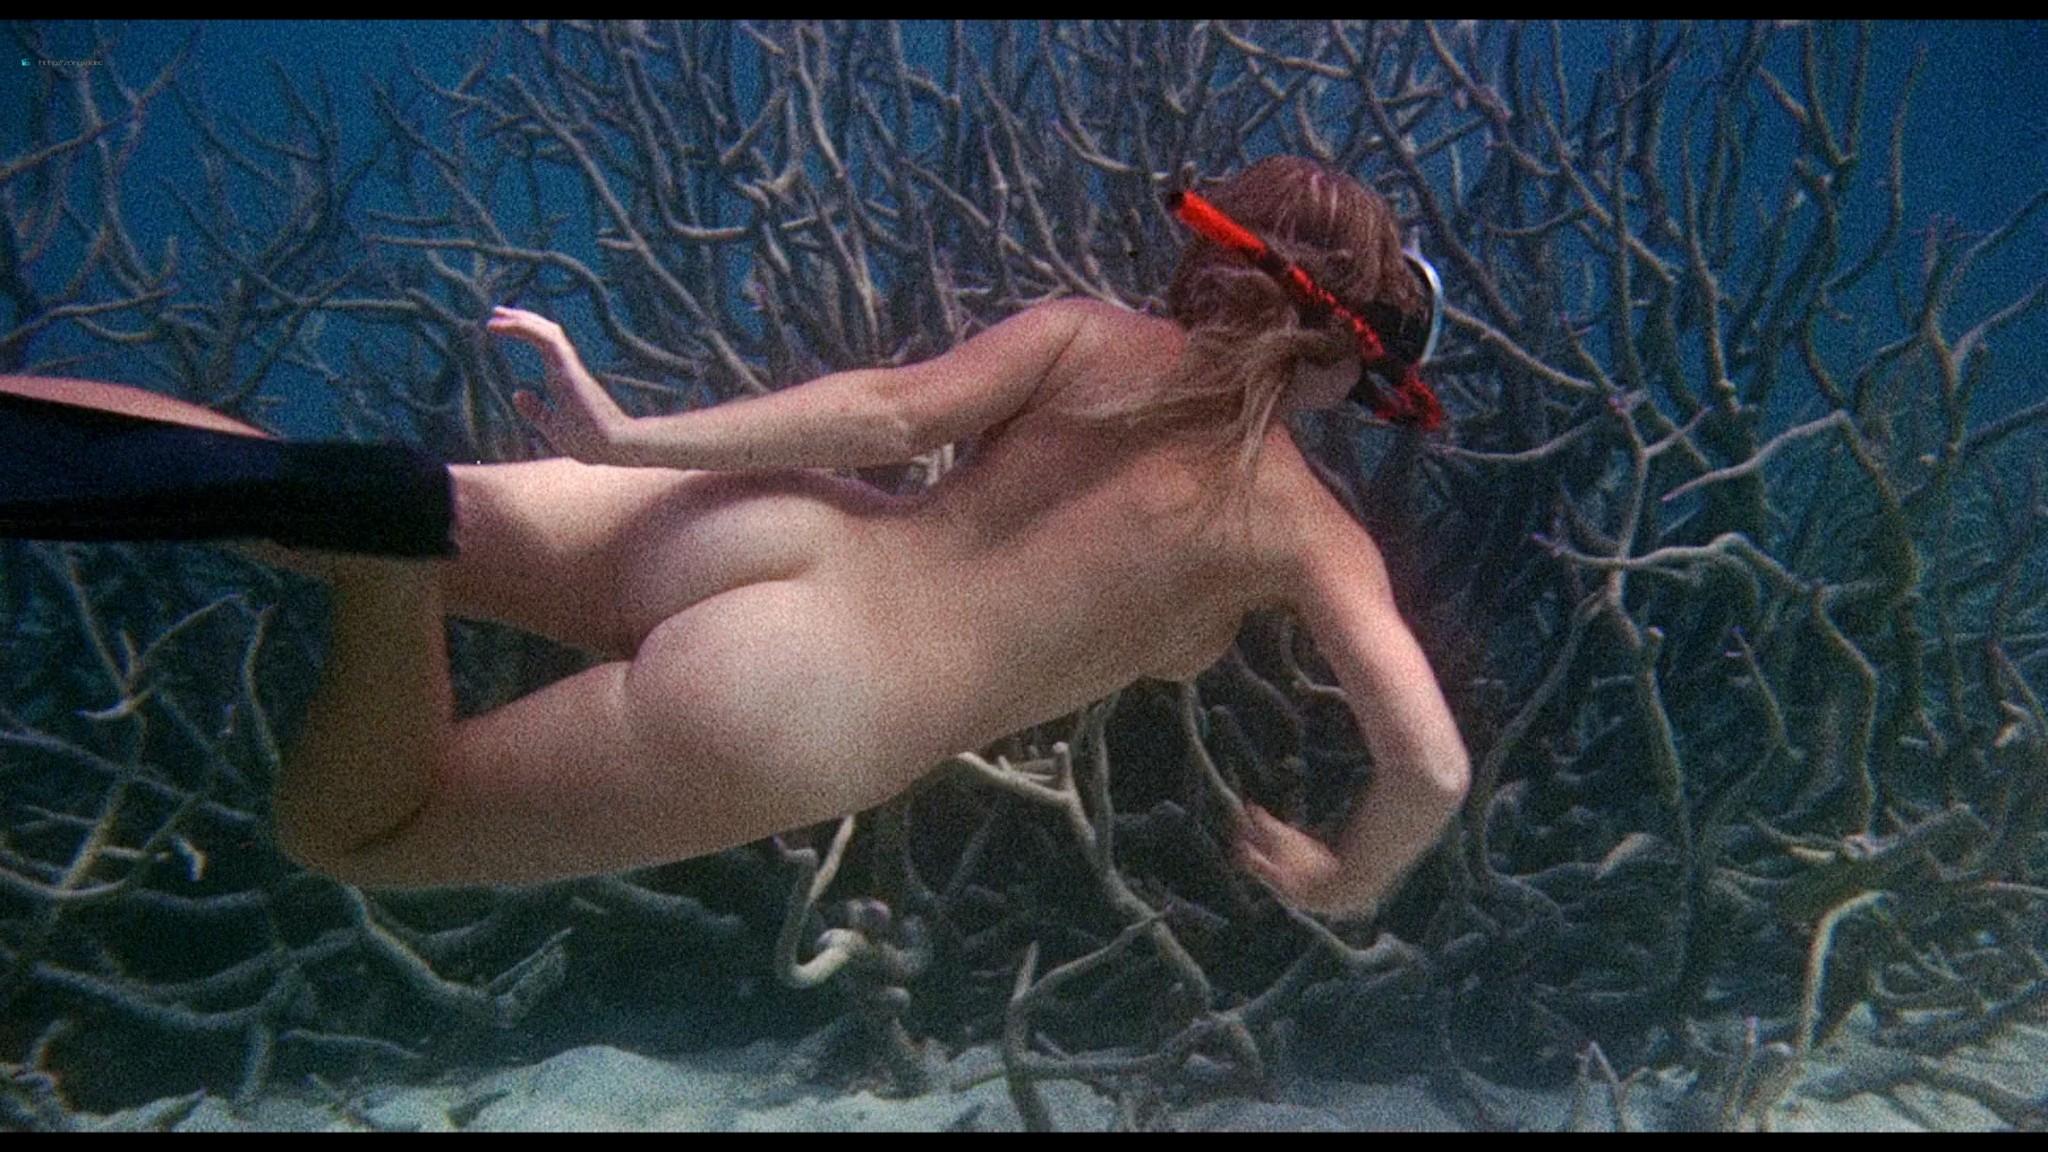 Helen Mirren nude skinny dipping Clarissa Kaye-Mason nude sex - Age of Consent (1969) HD 1080p BluRay Remux (10)